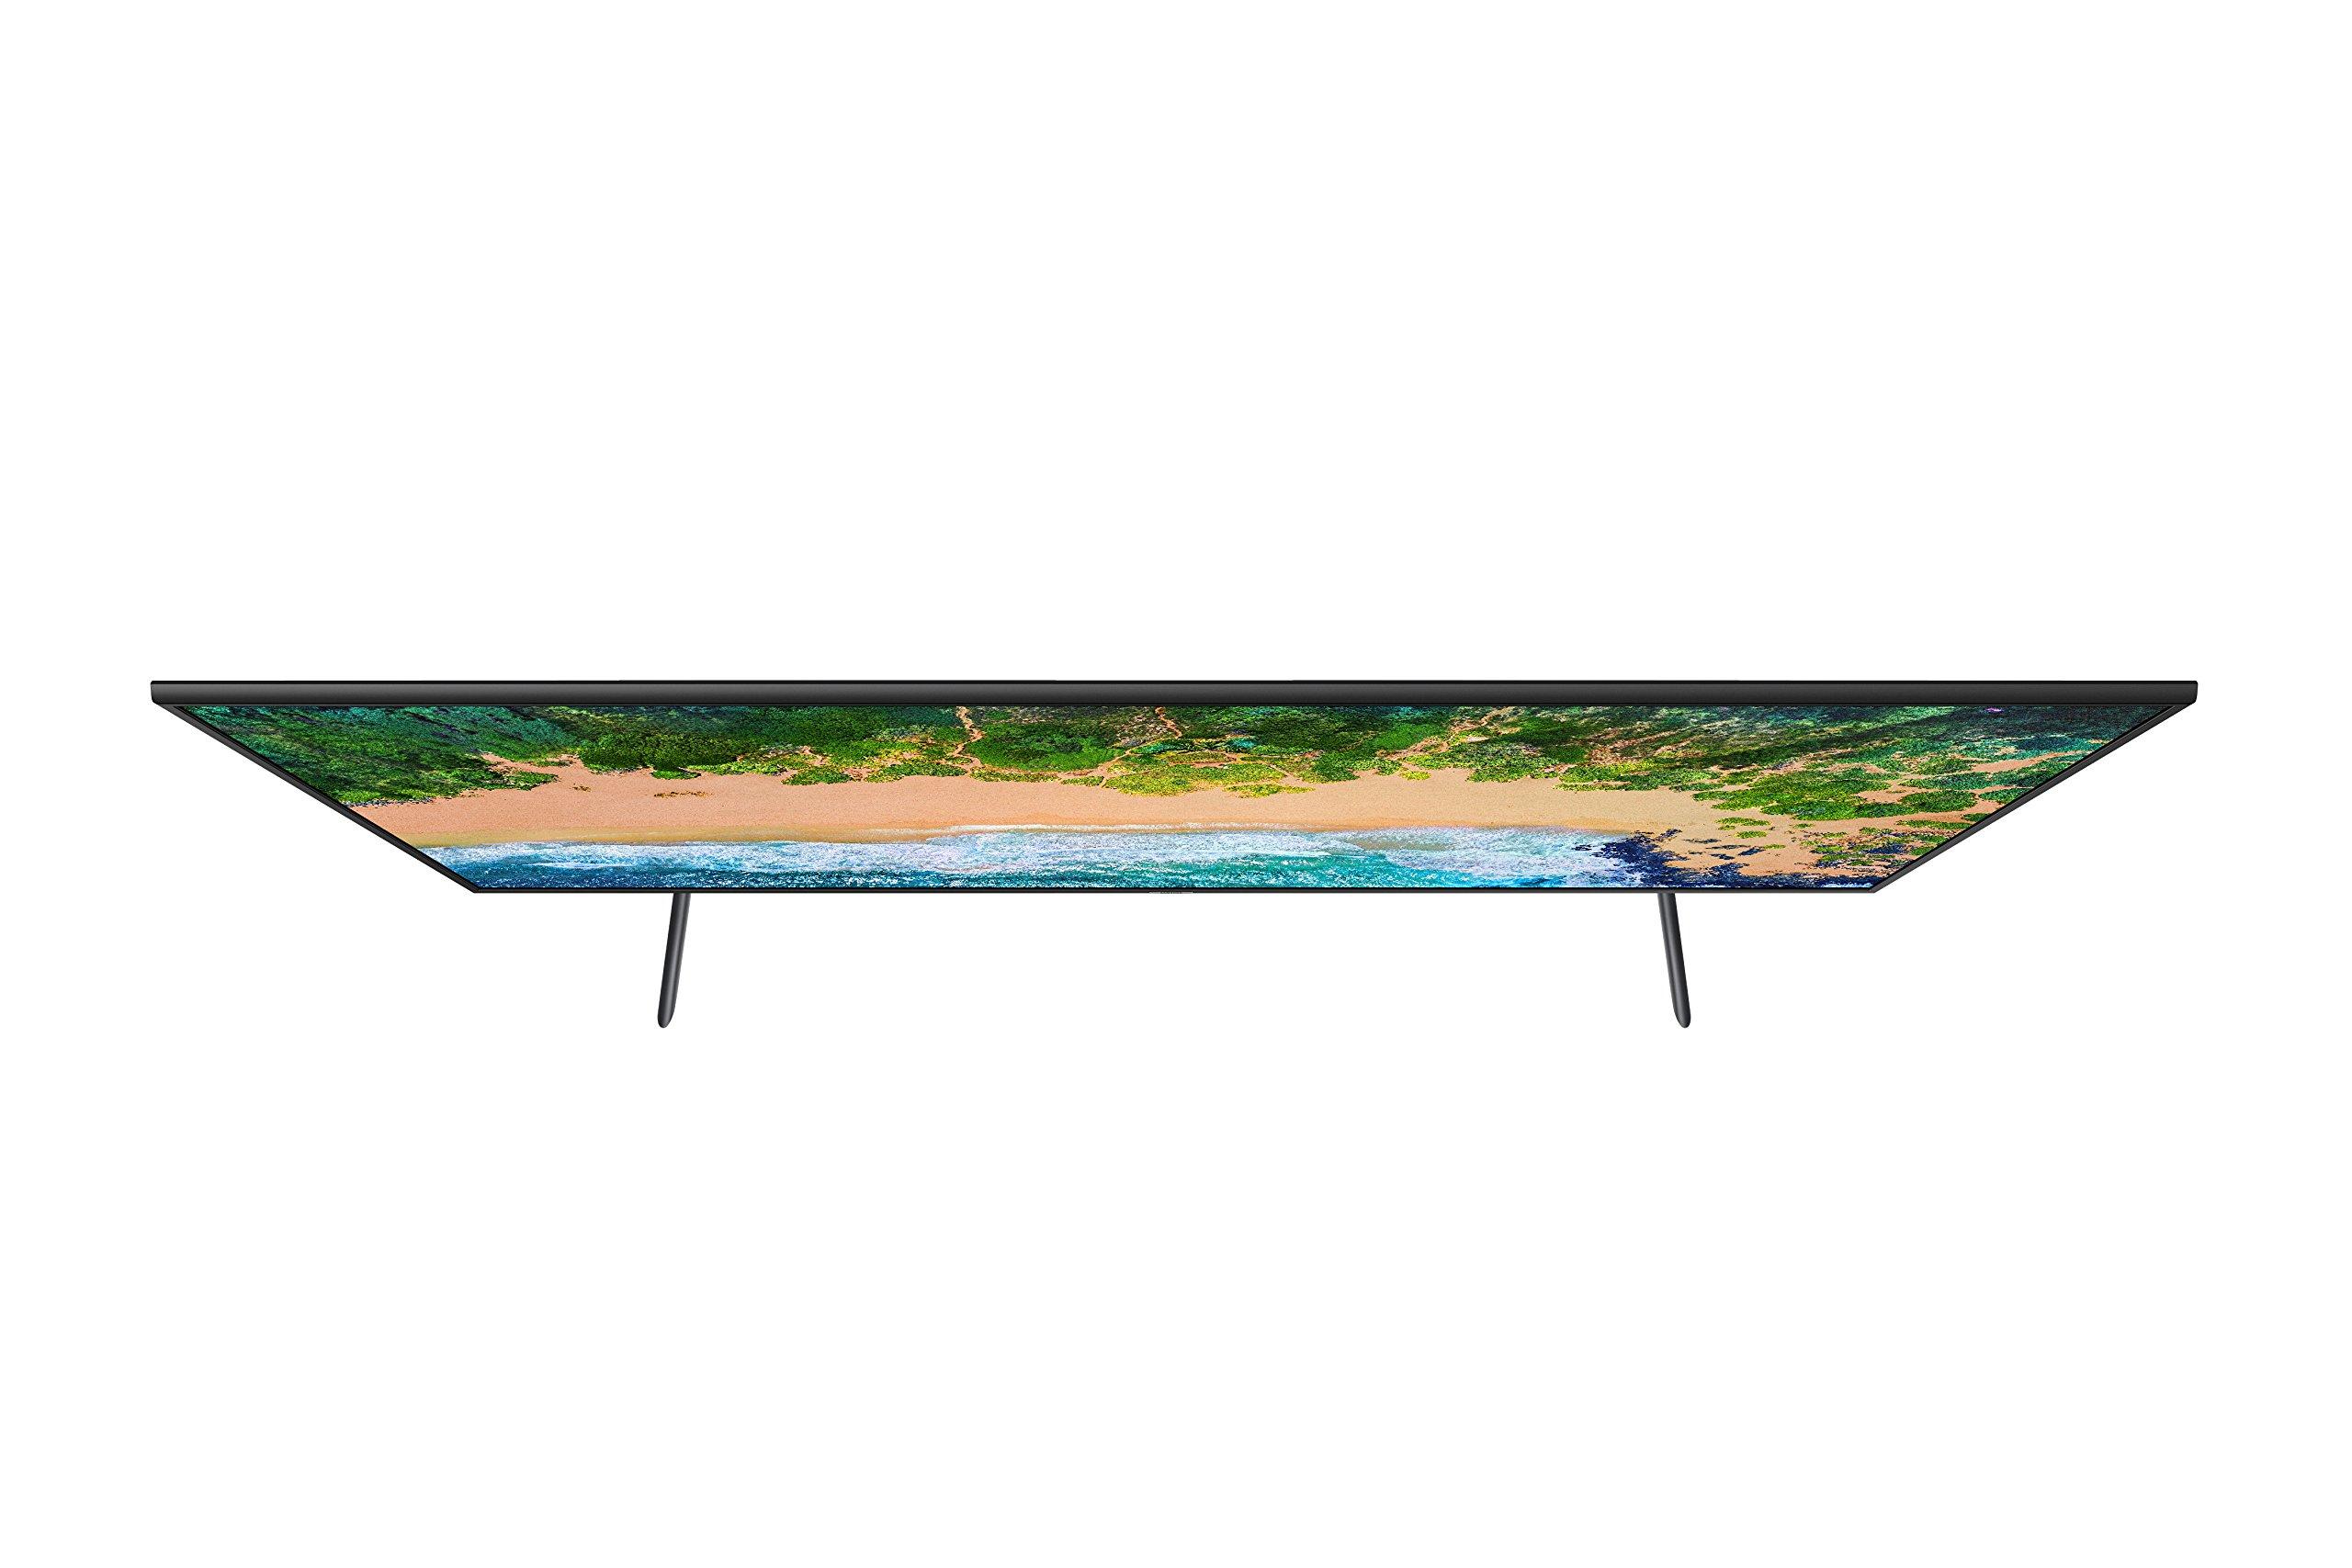 Samsung UN50NU7100 Flat 50'' 4K UHD 7 Series Smart TV 2018 by Samsung (Image #15)